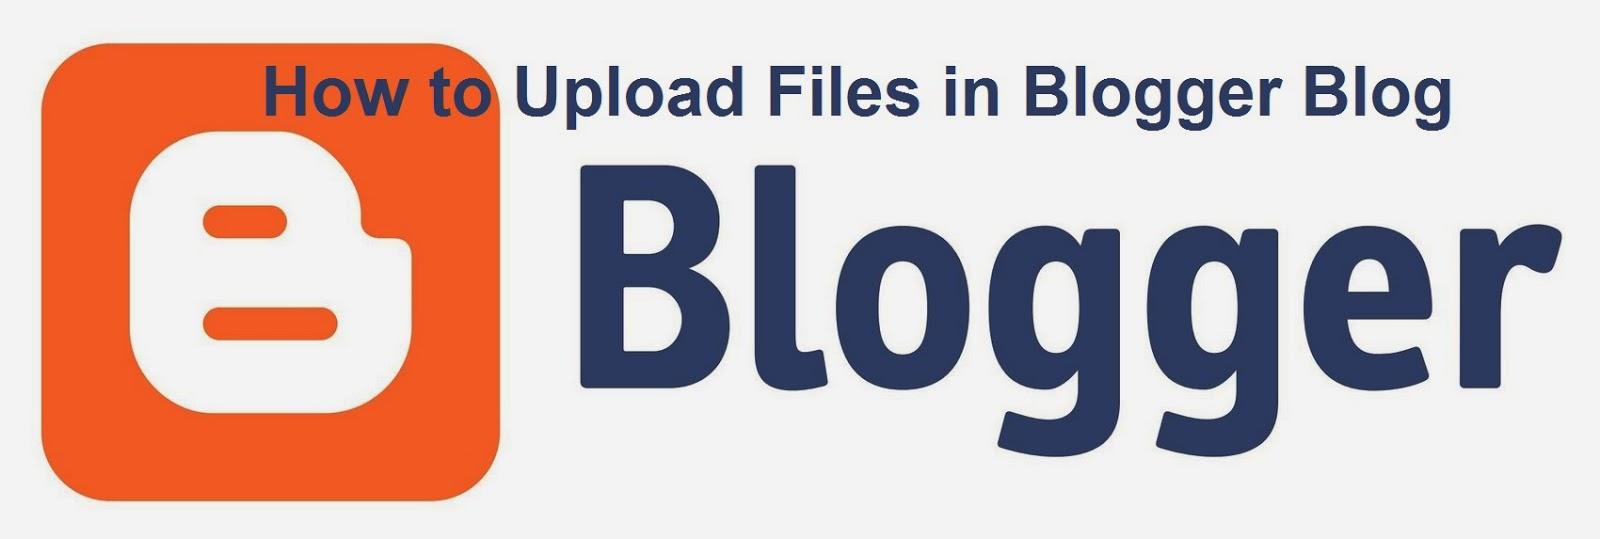 How to Upload Files in Blogger Blog : eAskme